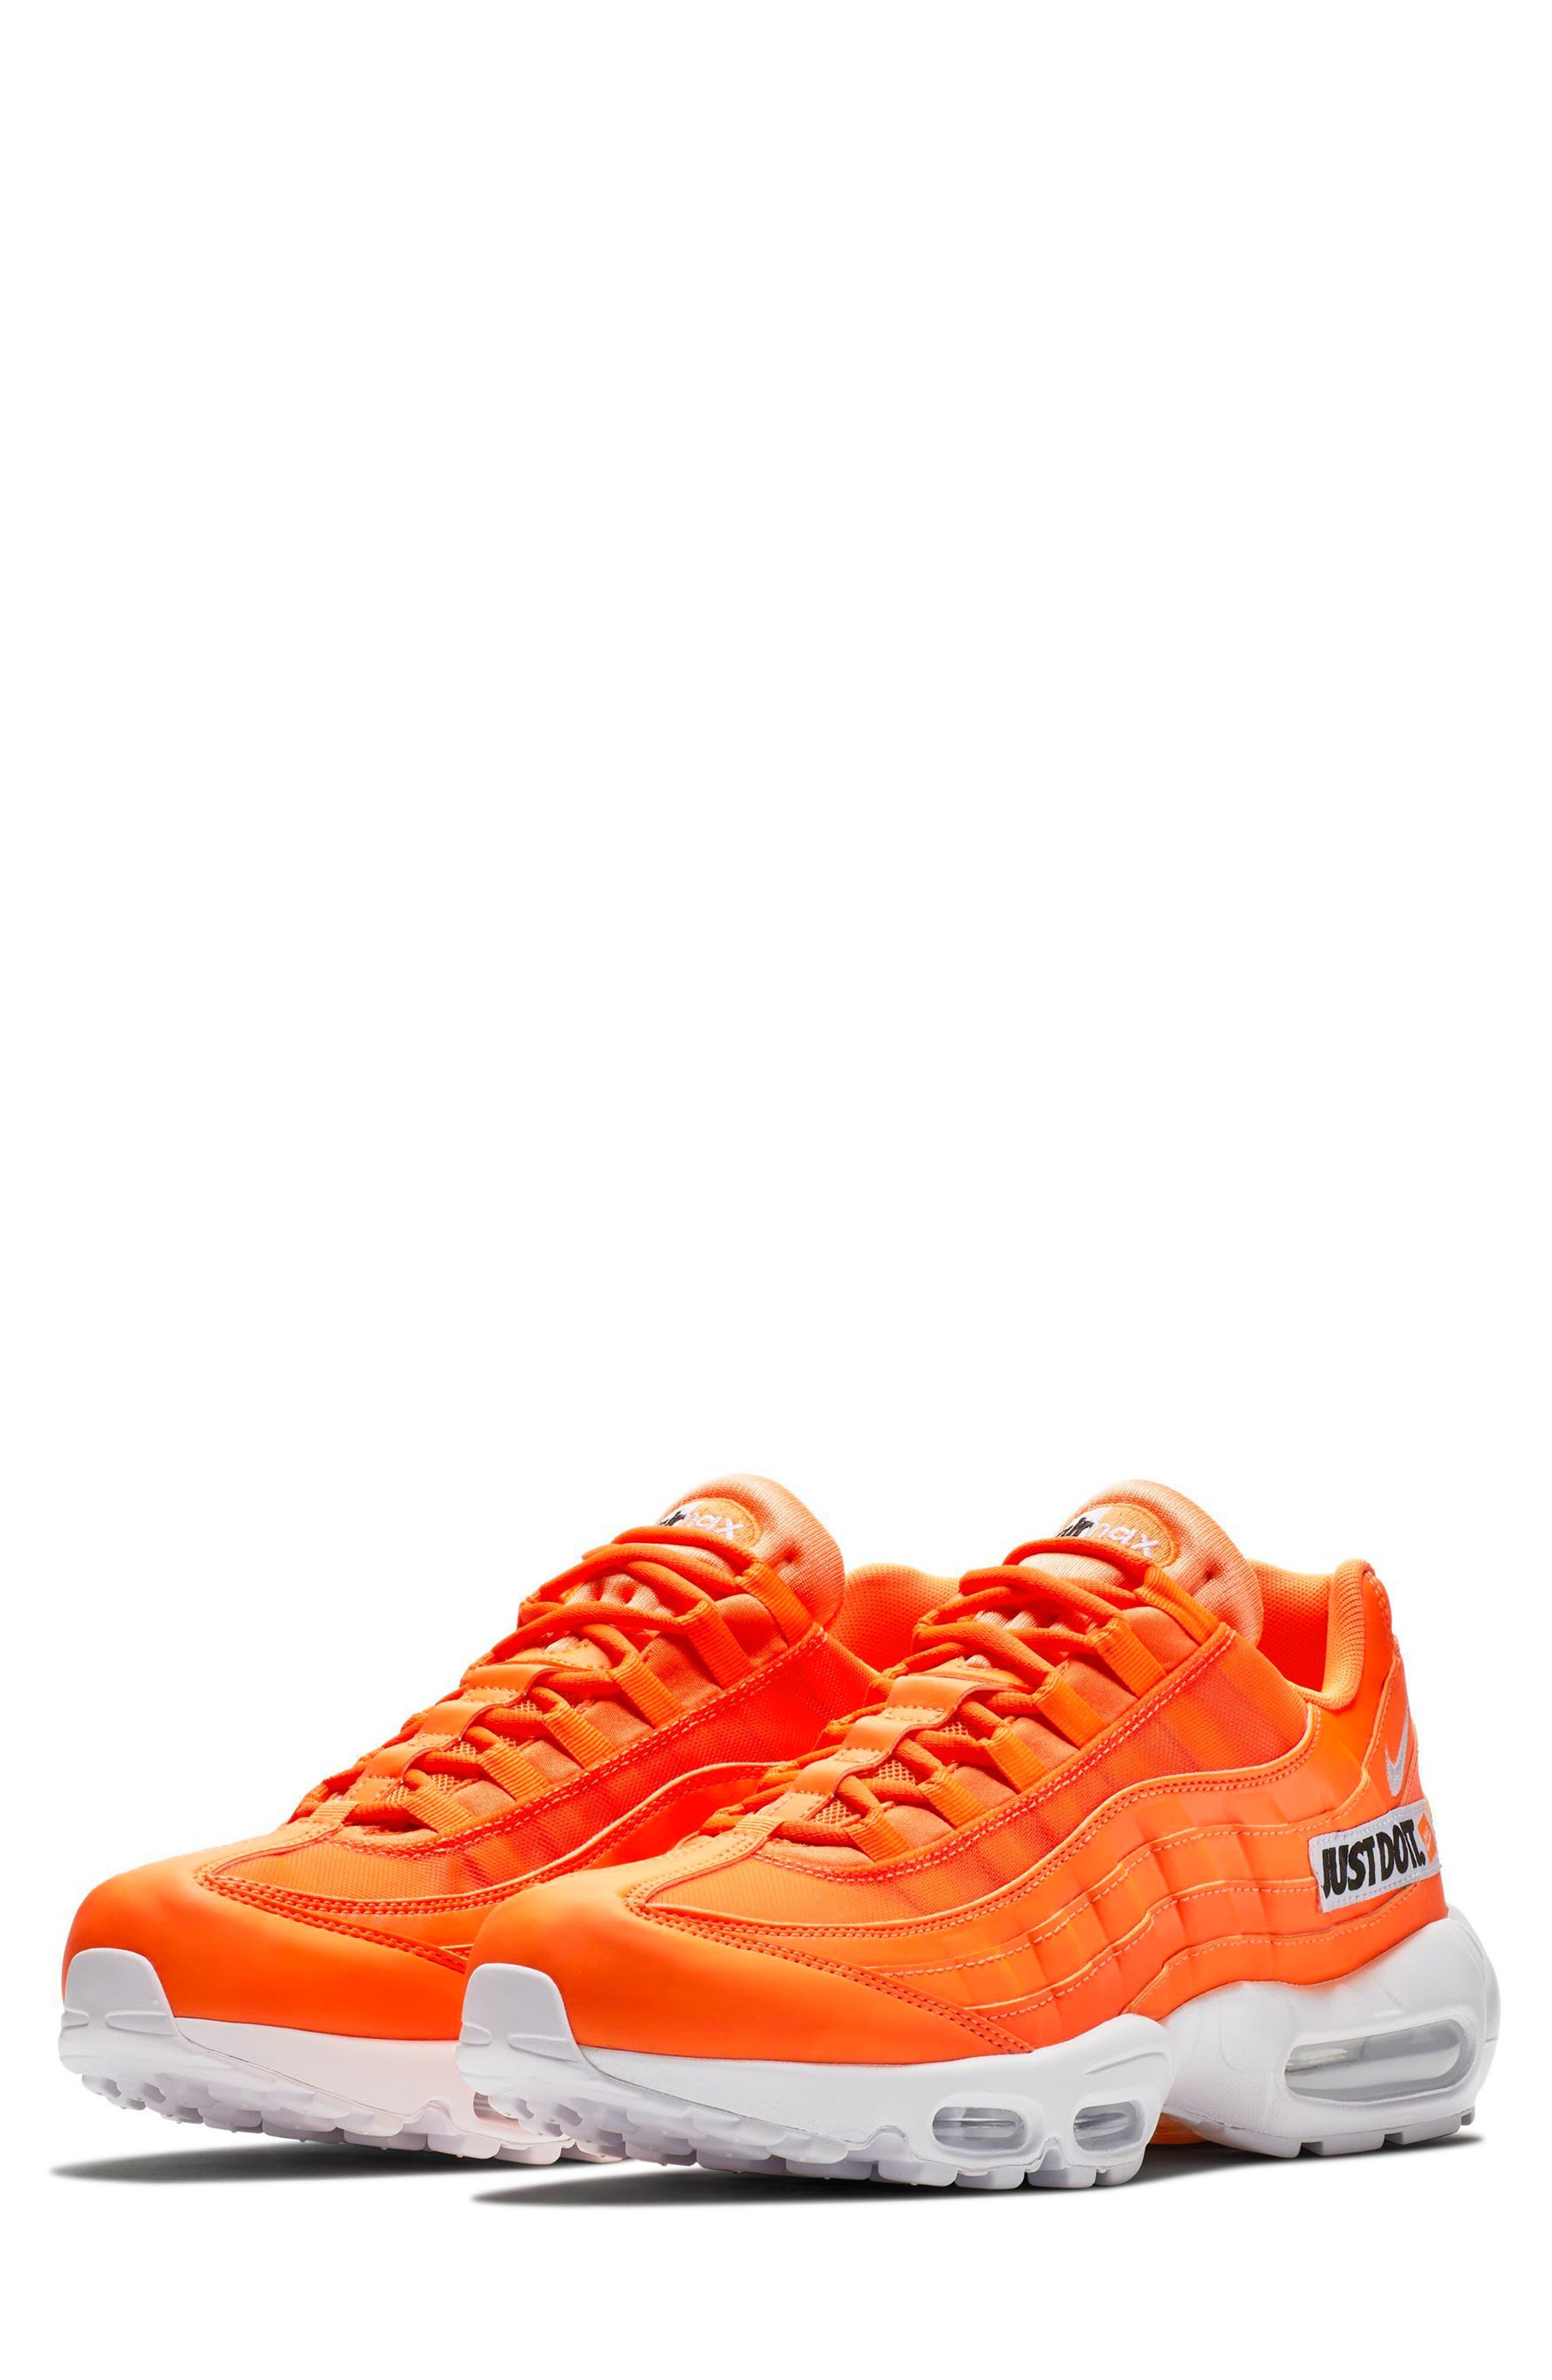 NIKE Air Max 95 SE Running Shoe, Main, color, 800